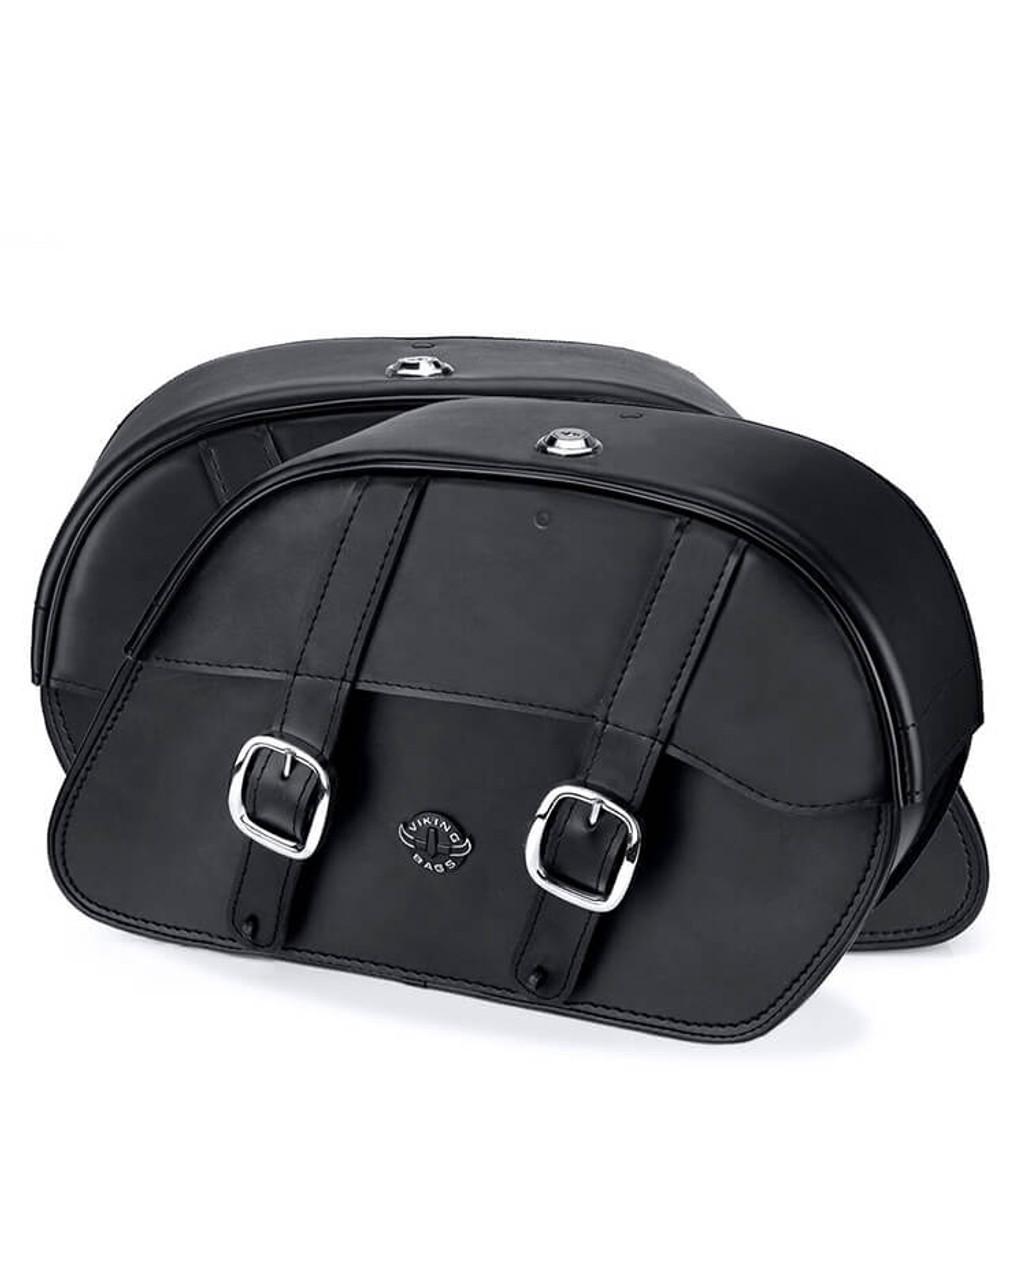 Viking Charger Slanted Medium Motorcycle Saddlebags For Harley Softail Cross Bones FLSTSB Both Bags View